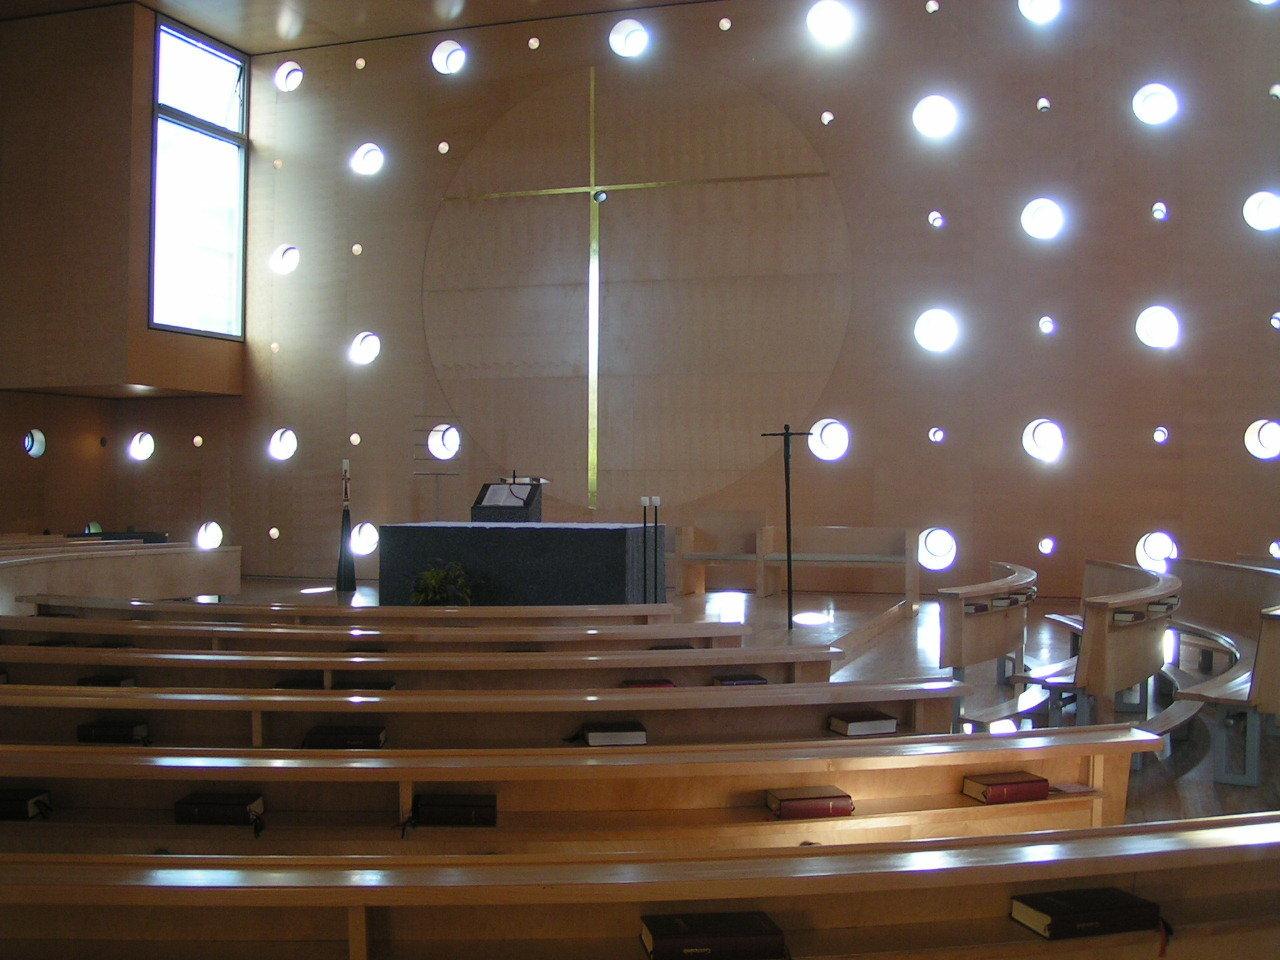 Chiesa dedicagta a Christus Hoffnung der Welt in Donau city, Wien. Progetto di Heinz Tesar.